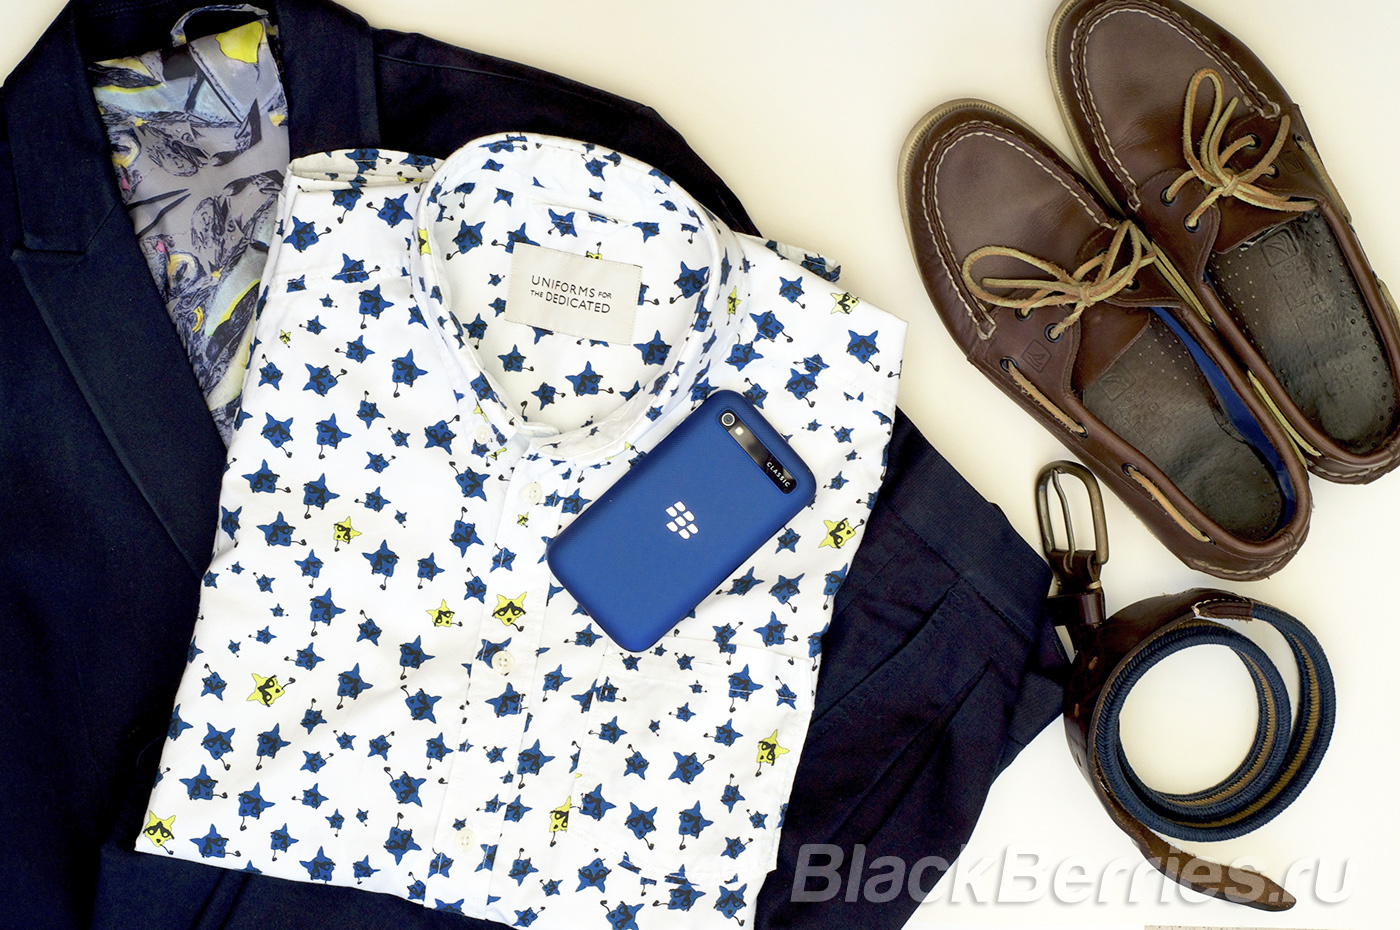 BlackBerry-Classic-Blue-Cobalt-19